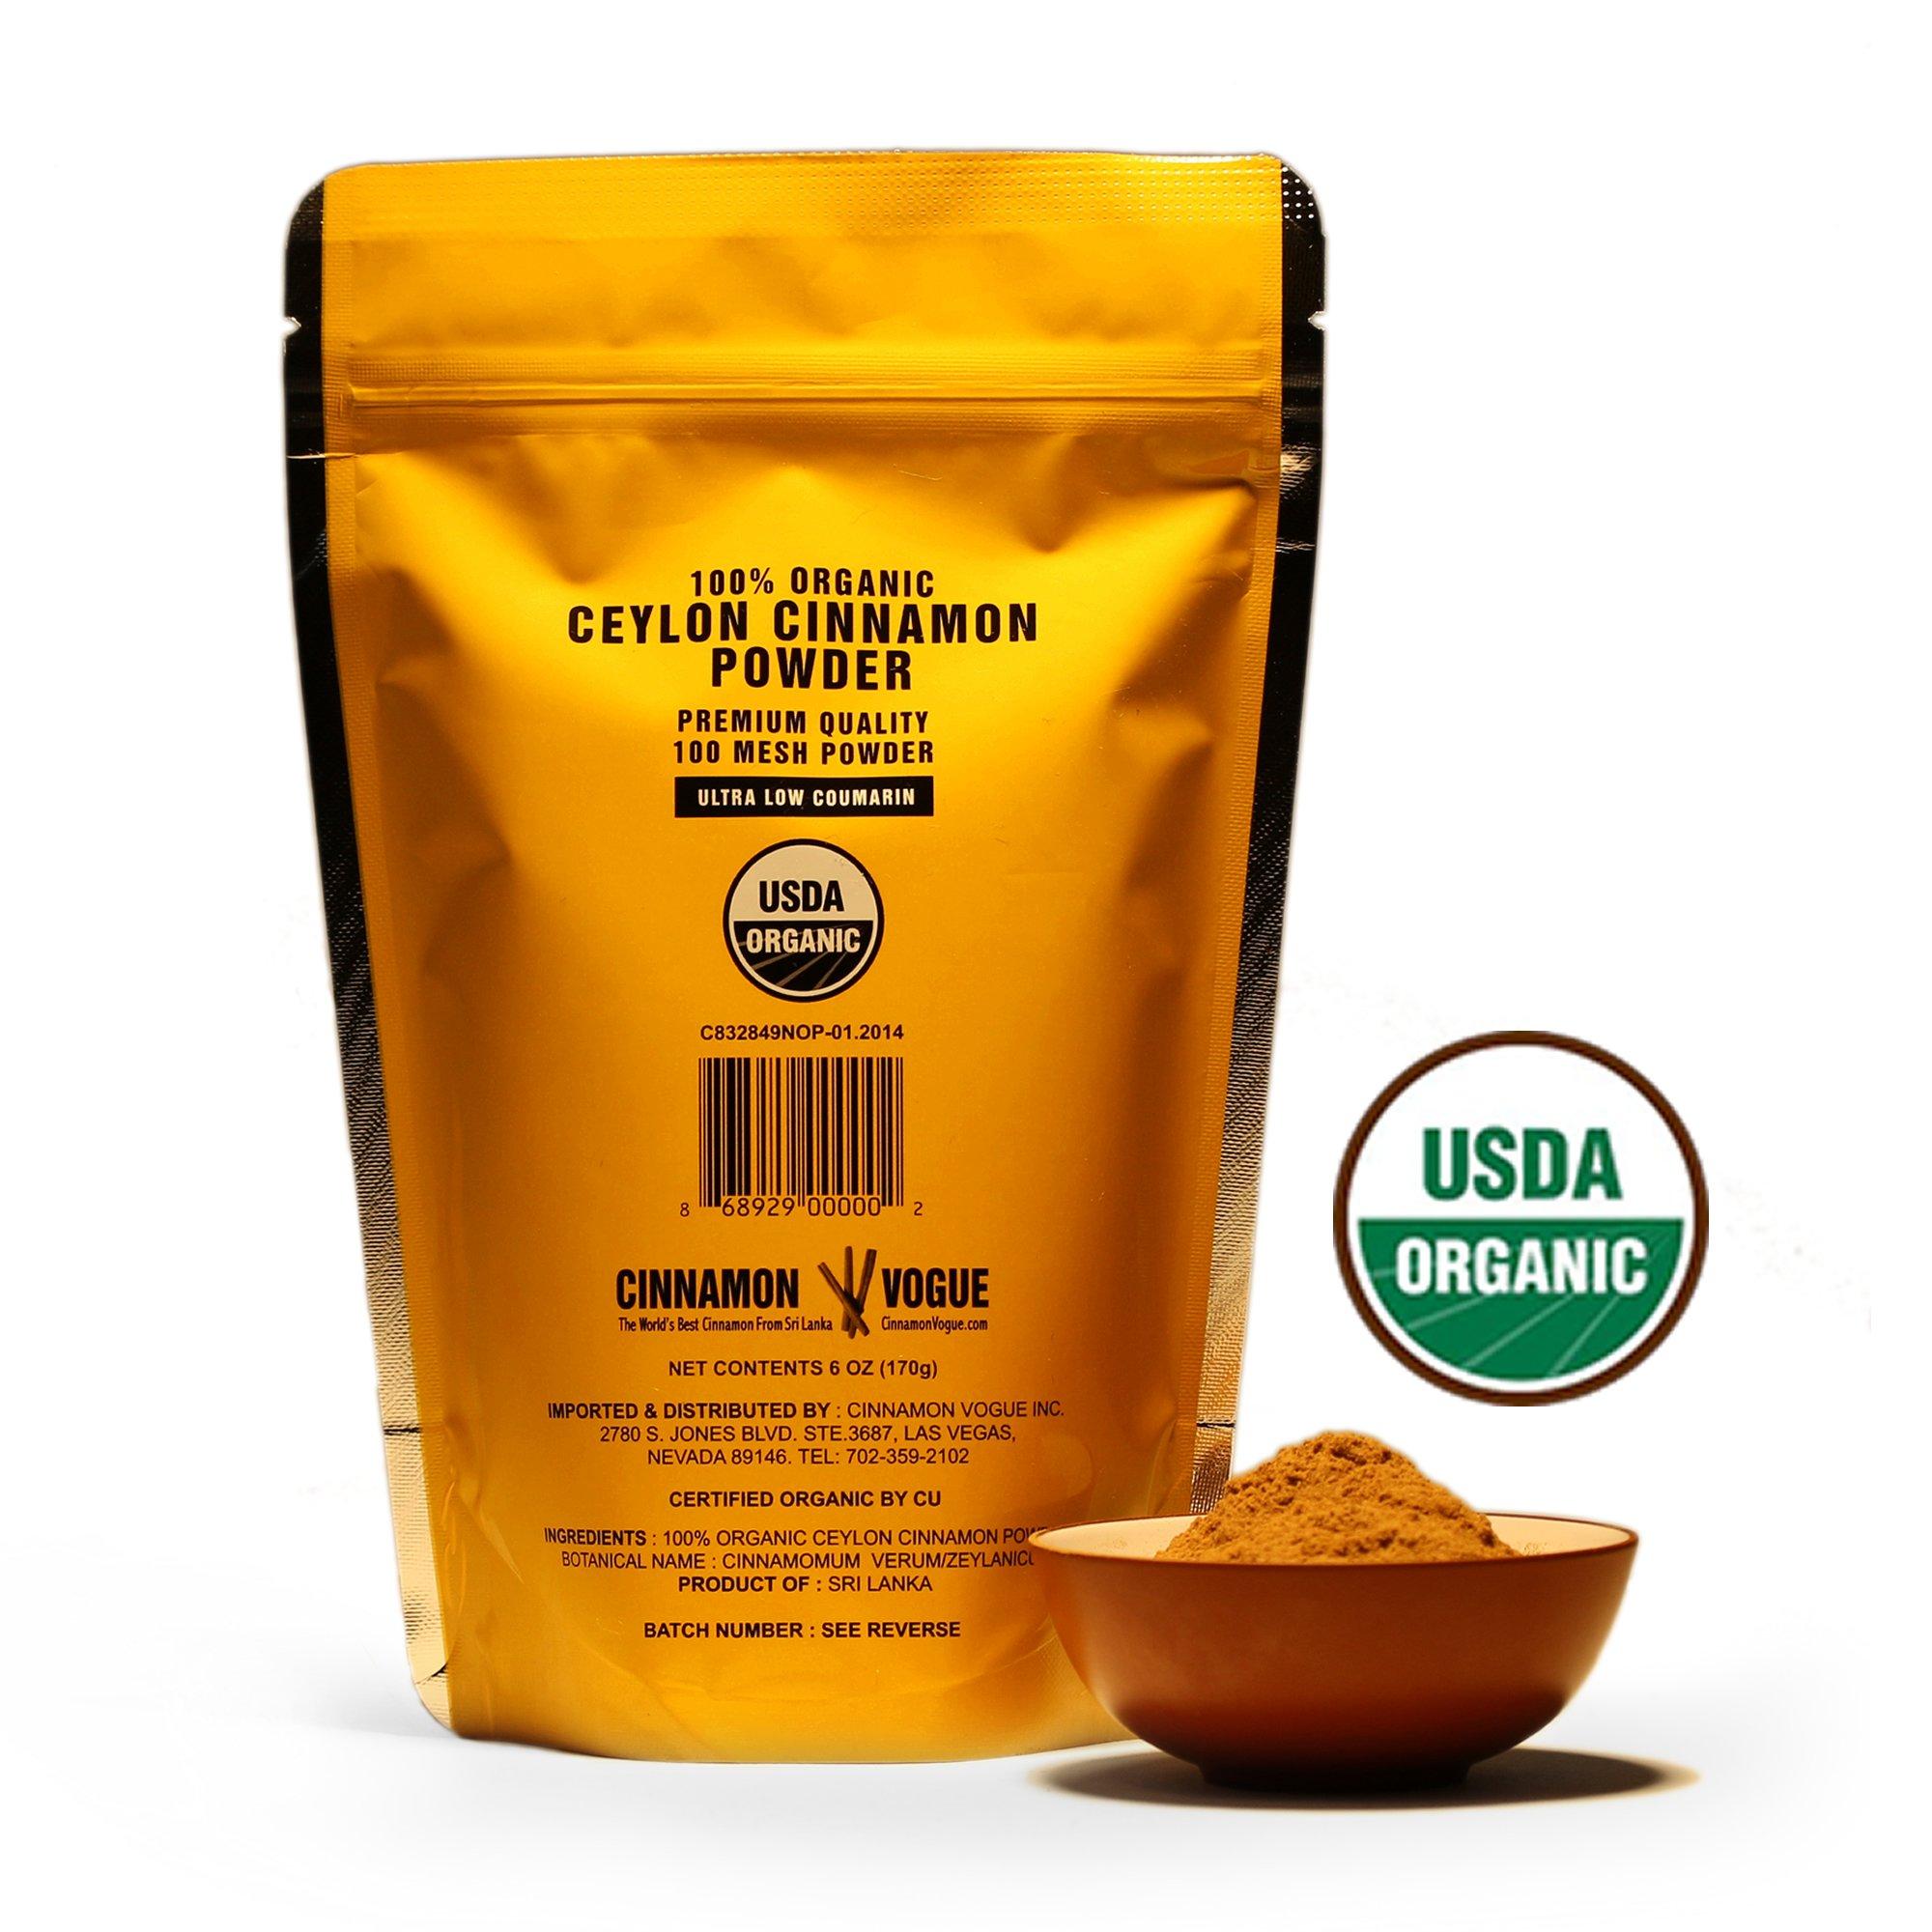 Ceylon Cinnamon Powder – 6 oz. (100% USDA Organic) - Ultra Premium Fine 100 Mesh Powder, Salt Free, Non irradiated, Low Coumarin by Cinnamon Vogue (Image #2)